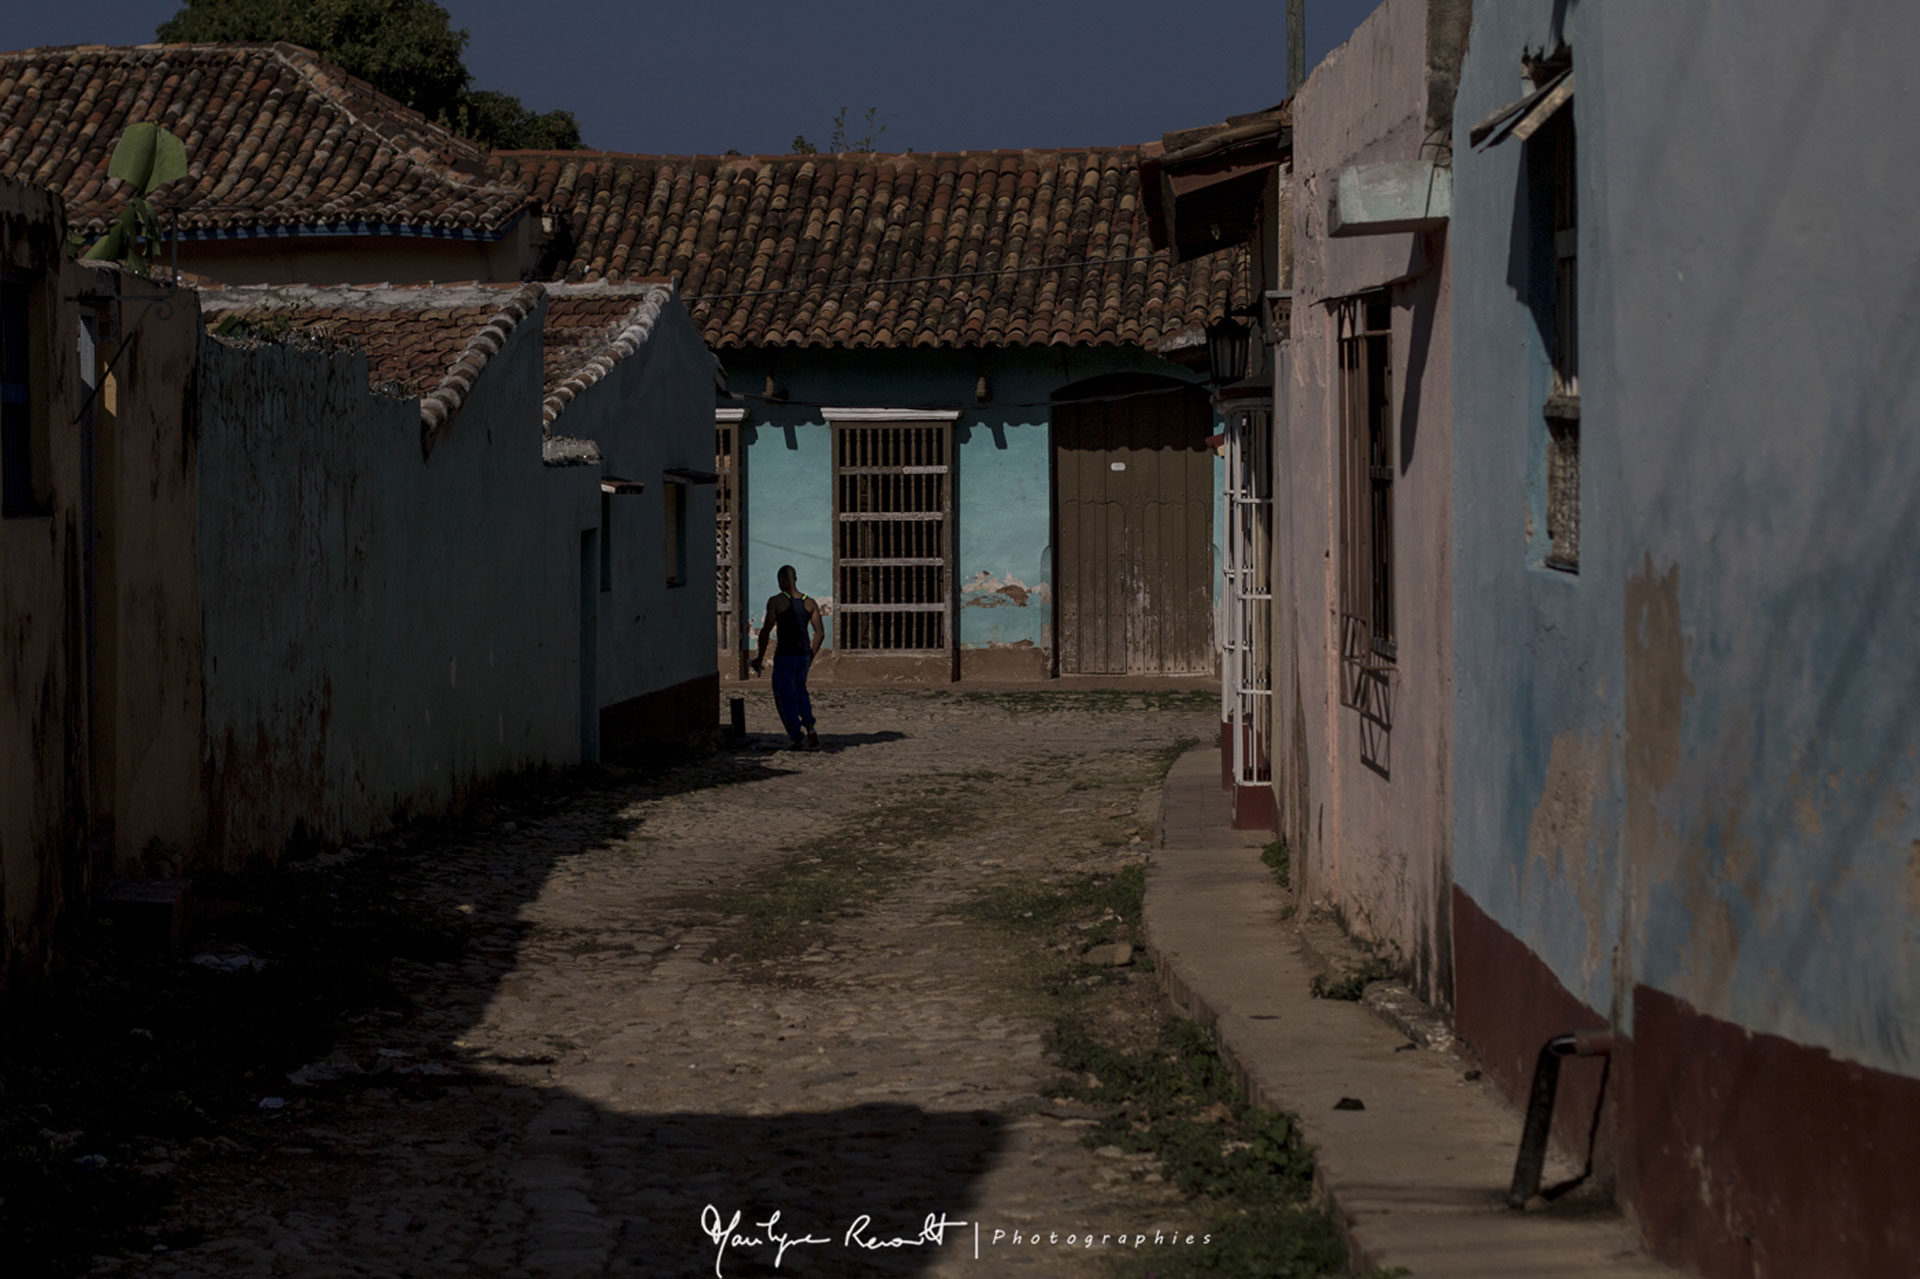 14-Cuba-marilyne renoult